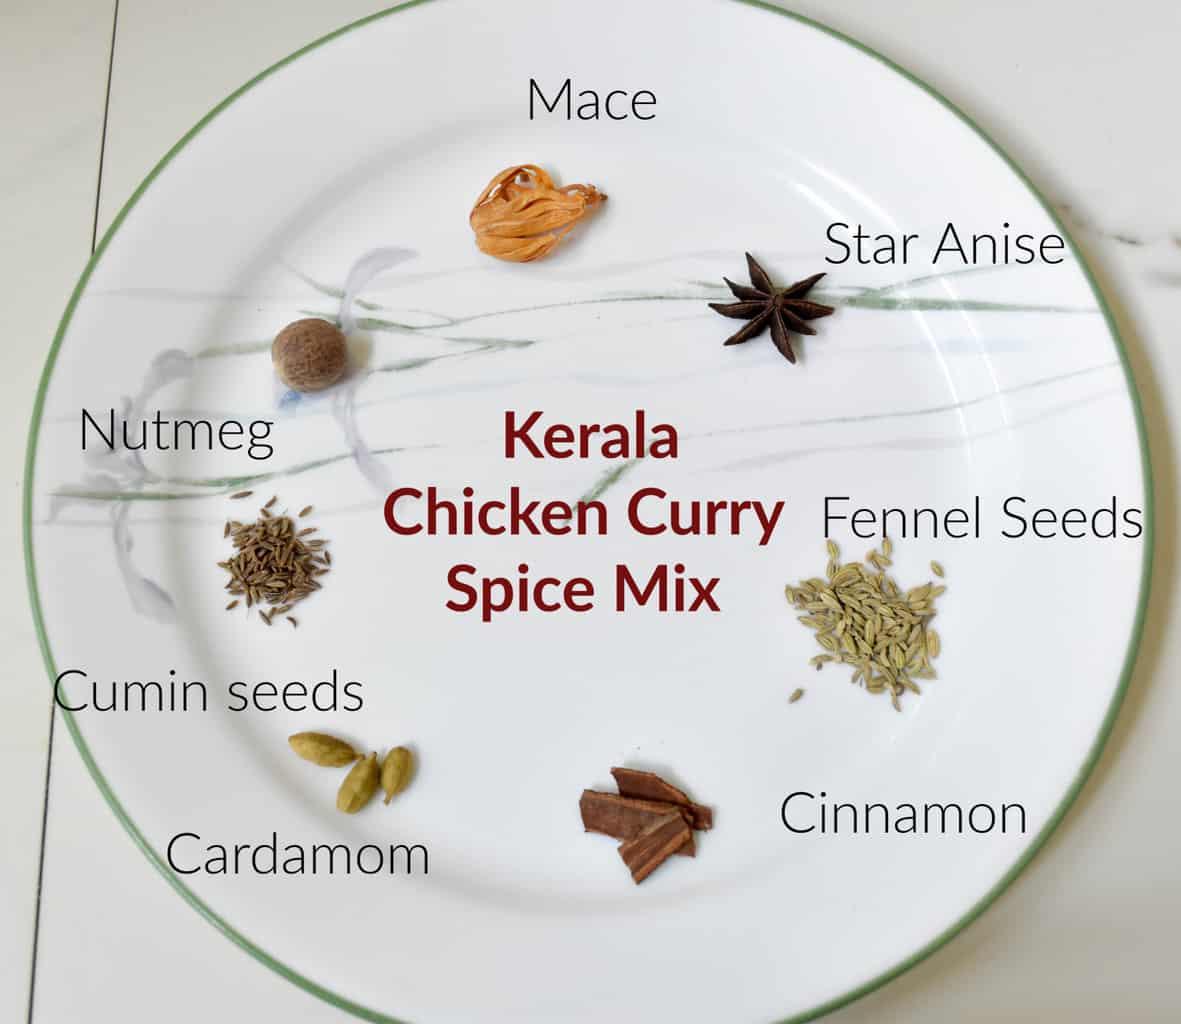 "<img src=""https://cdn.shortpixel.ai/client/q_glossy,ret_img,w_1500,h_1301/spice mix.jpg"" alt=""Kerala chicken curry spice mix>"